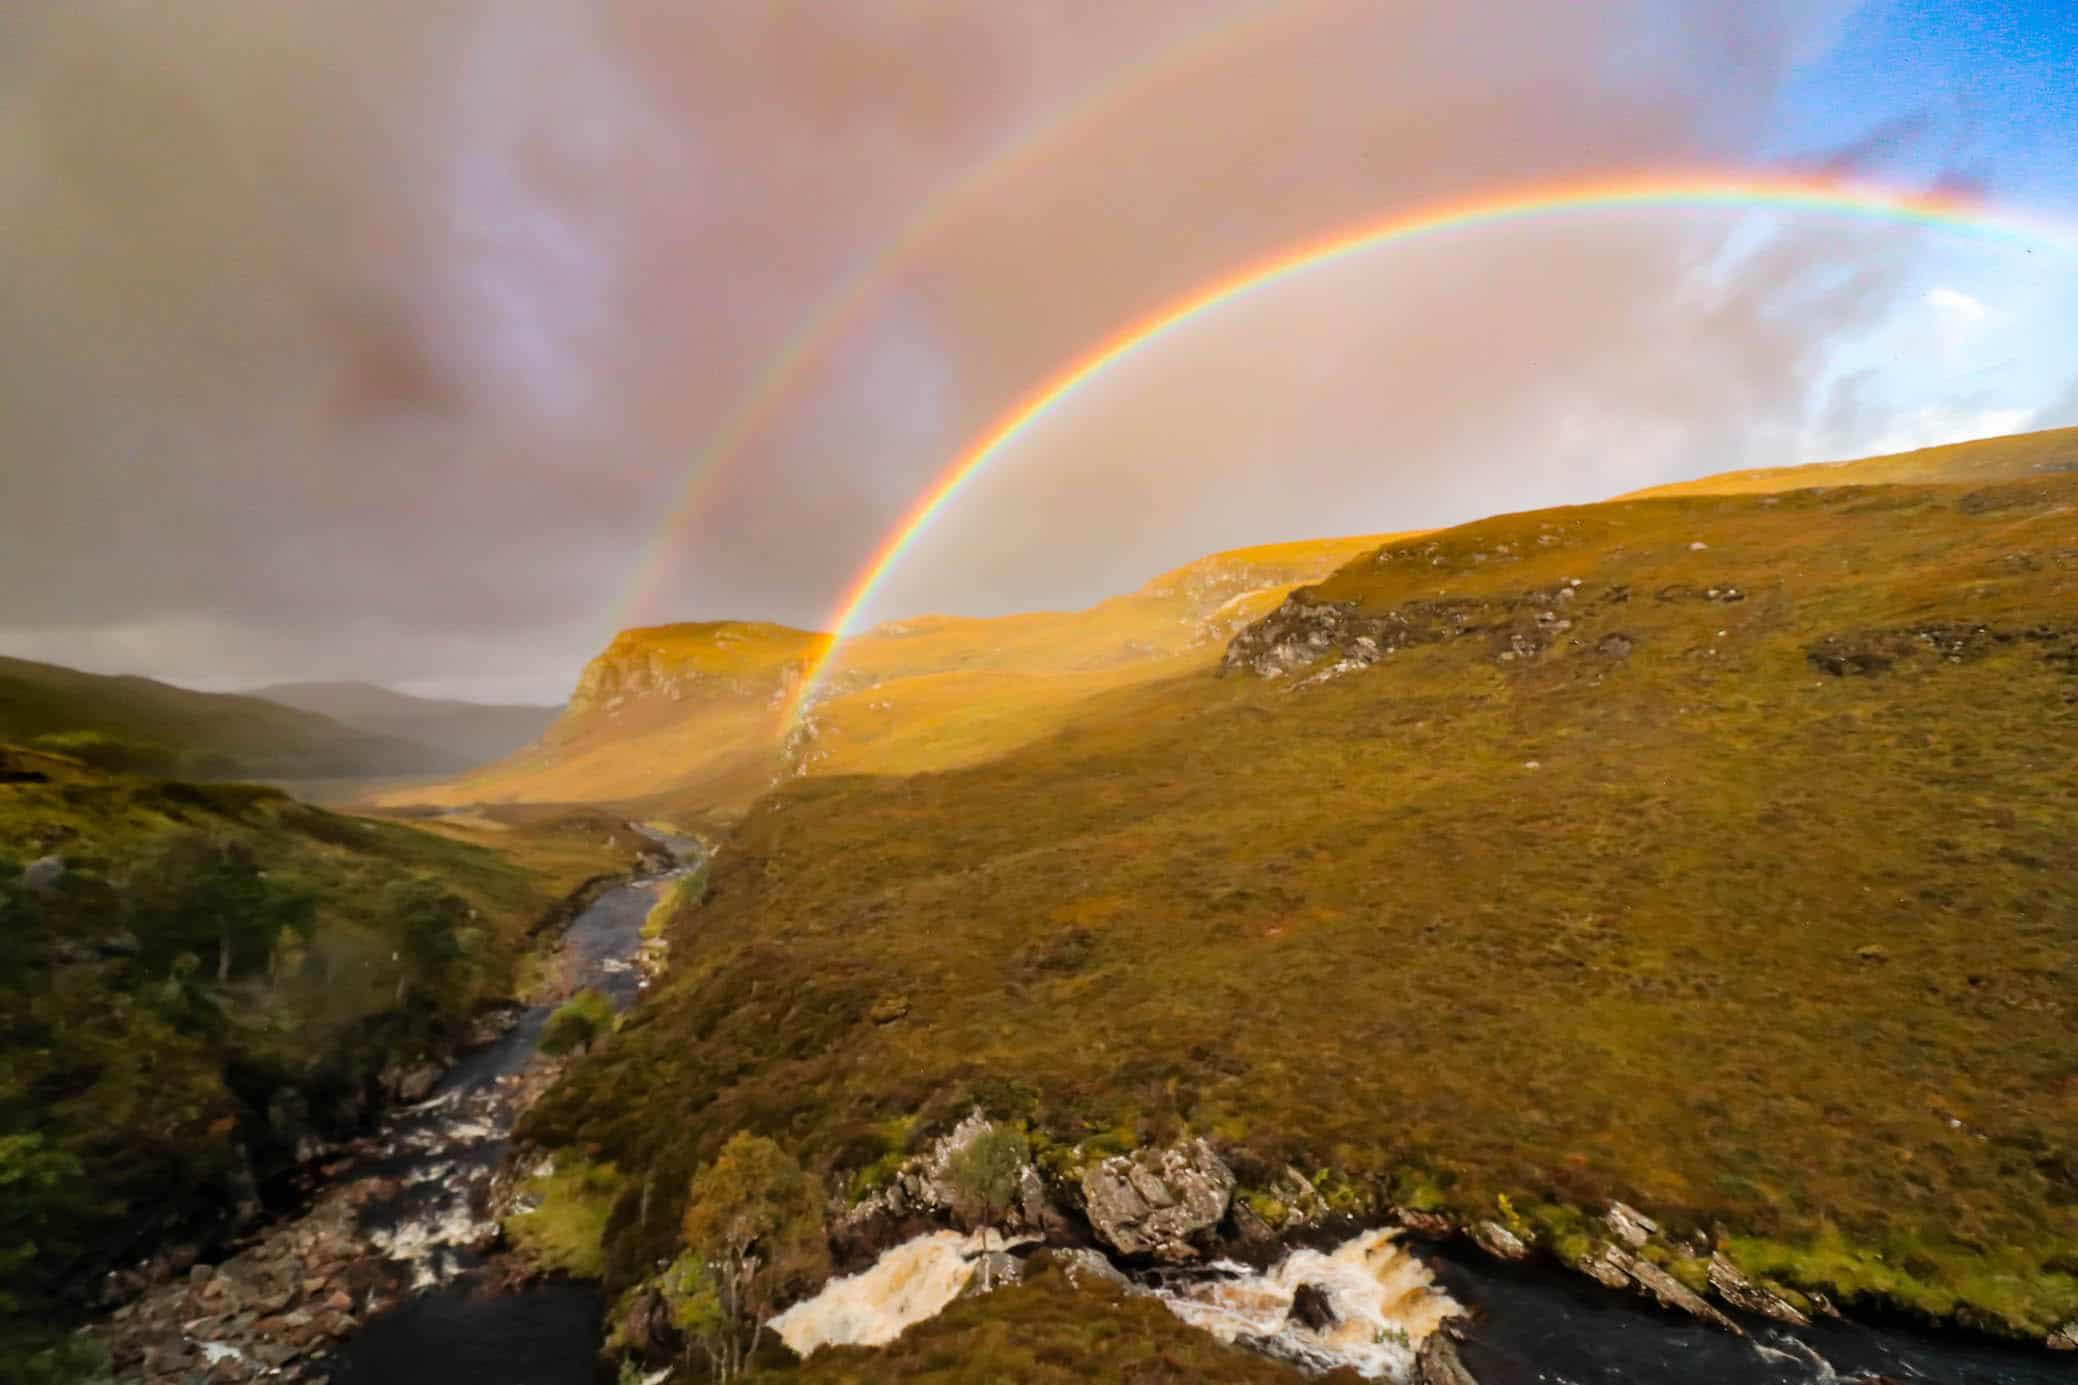 Rainbows in the Scottish Highlands